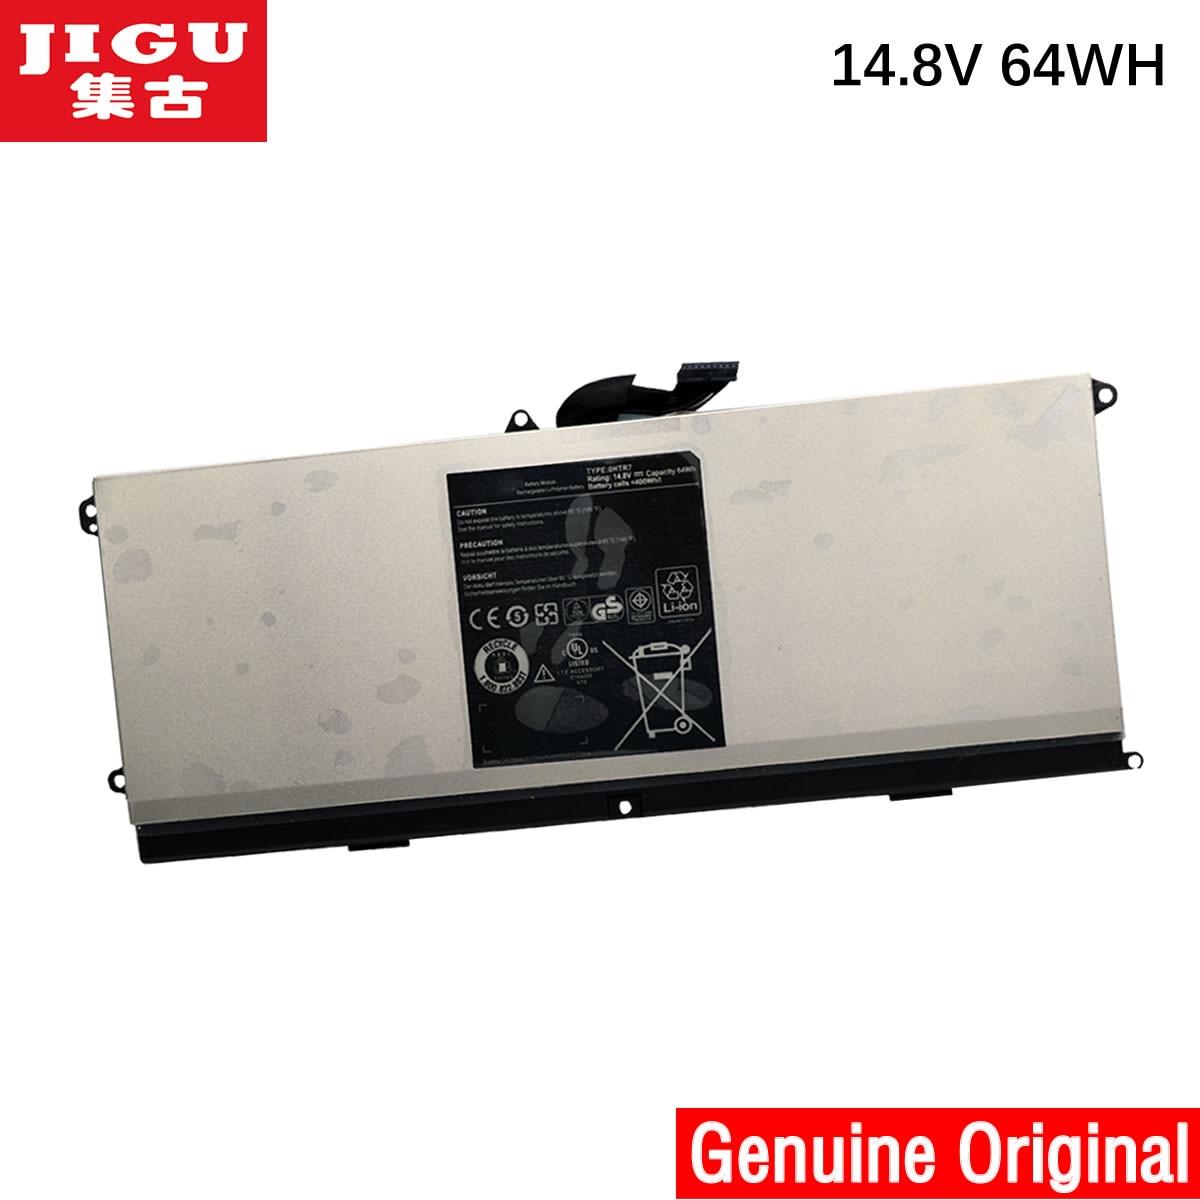 JIGU 14,8 V 64Wh Original 0NMV5C 75WY2 075WY2 Original batería del ordenador portátil para Dell XPS 15z L511Z OHTR7 0HTR7 NMV5C